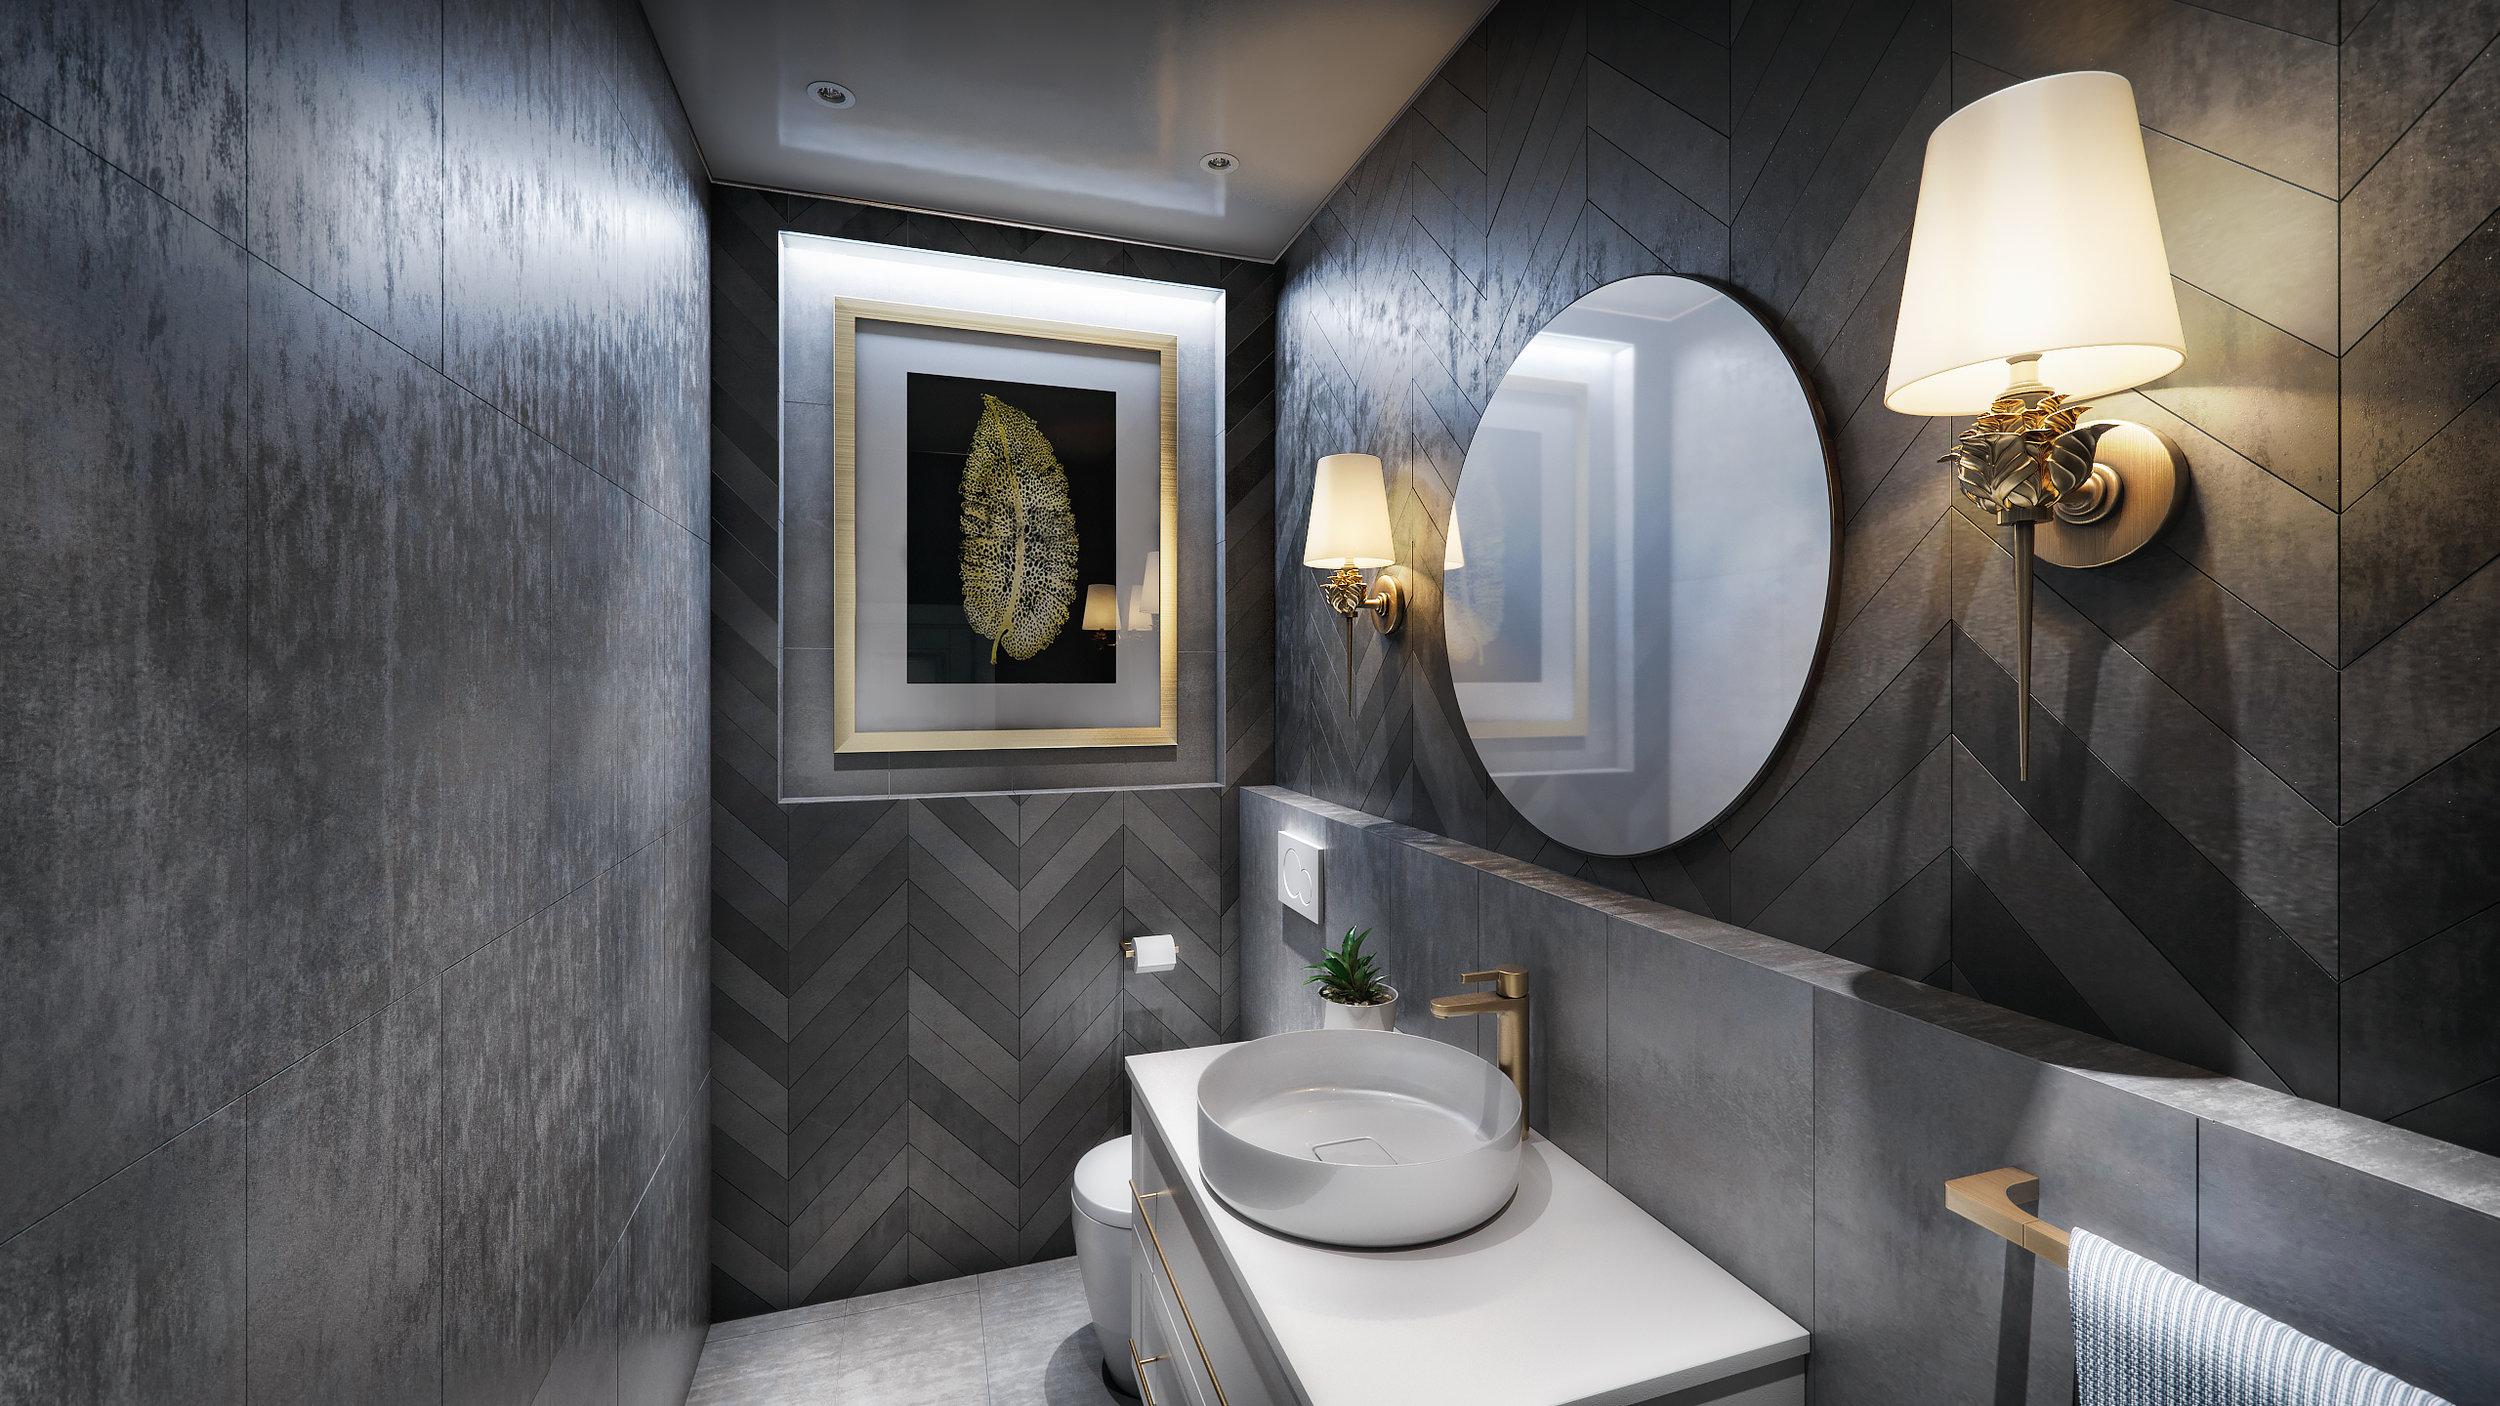 Bathroom_3D view 1_Final.jpg